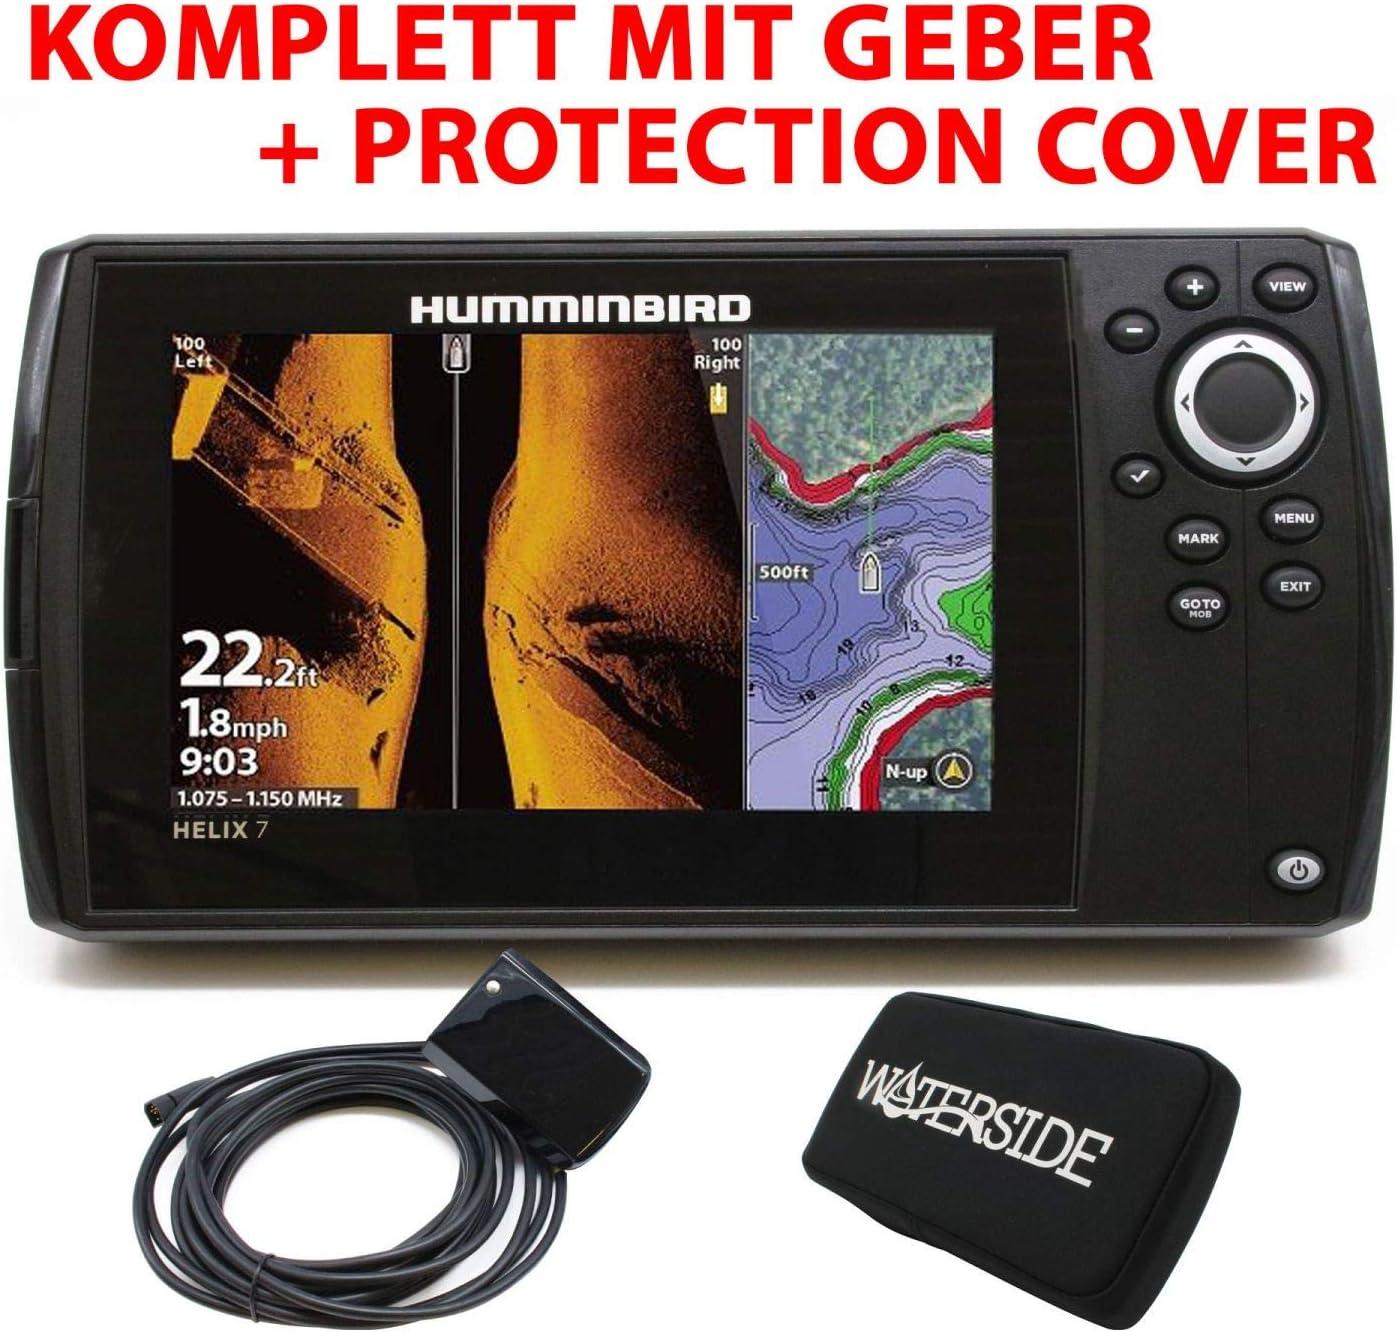 【HUMMINBIRD/ハミンバード】HELIX 7 CHIRP MEGA SI GPS G3N マップ無し GPS魚探 魚群探知機 航海計器